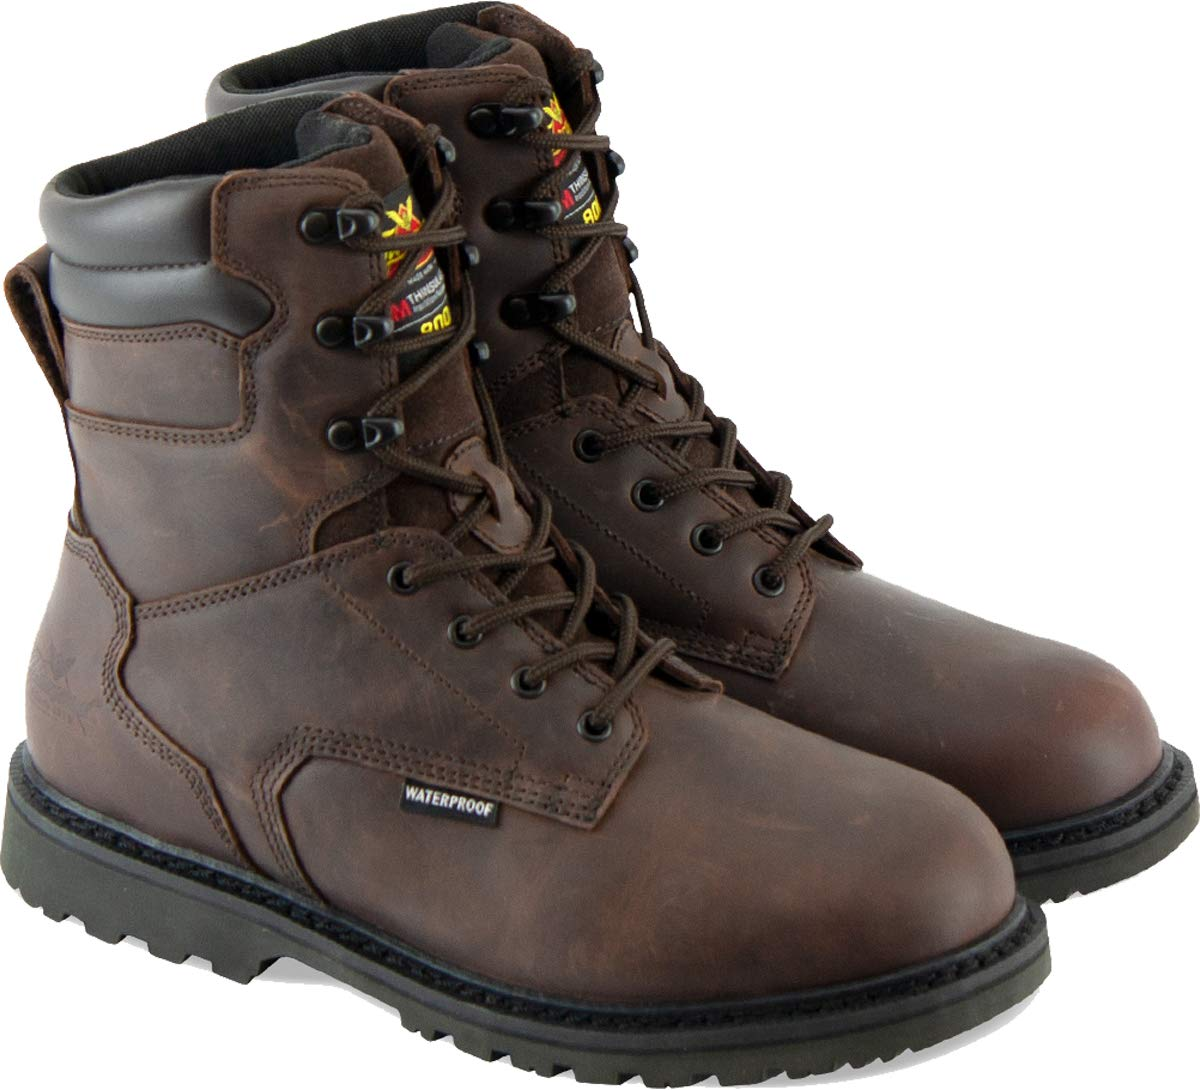 "Thorogood Men's V-Series 8"" 800g Insulated Waterproof, Hunting Boot"